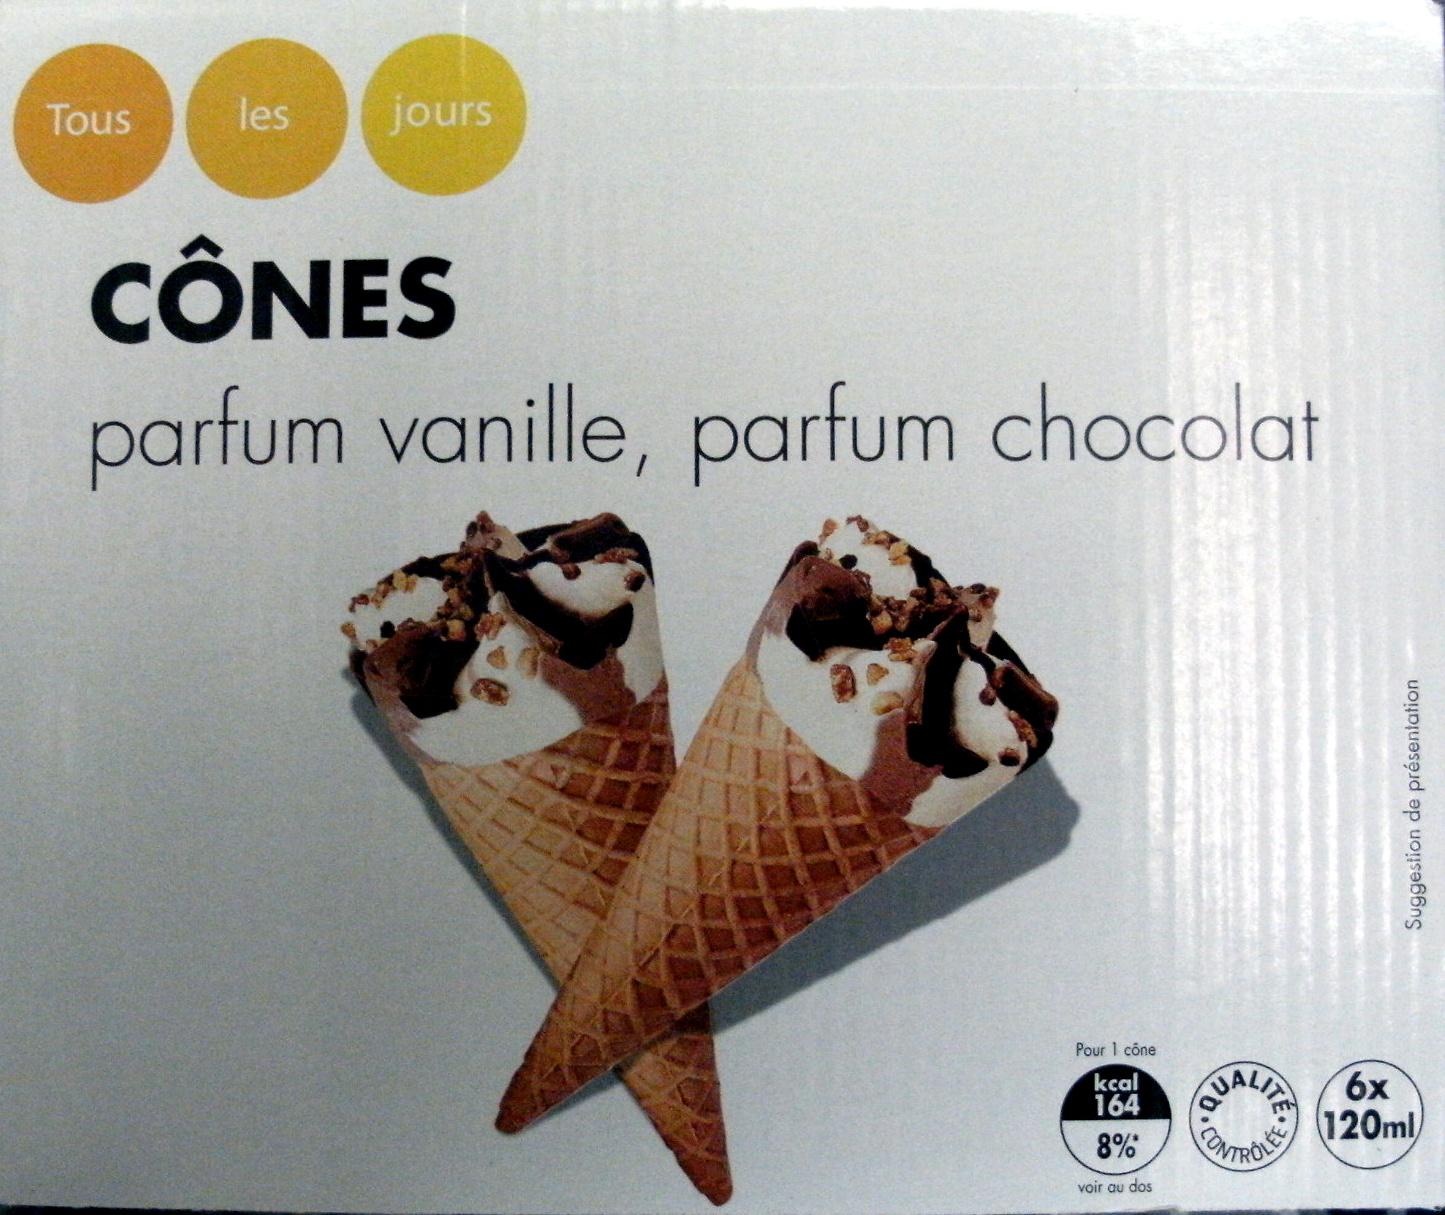 Cônes parfum vanille, parfum chocolat - Produit - fr